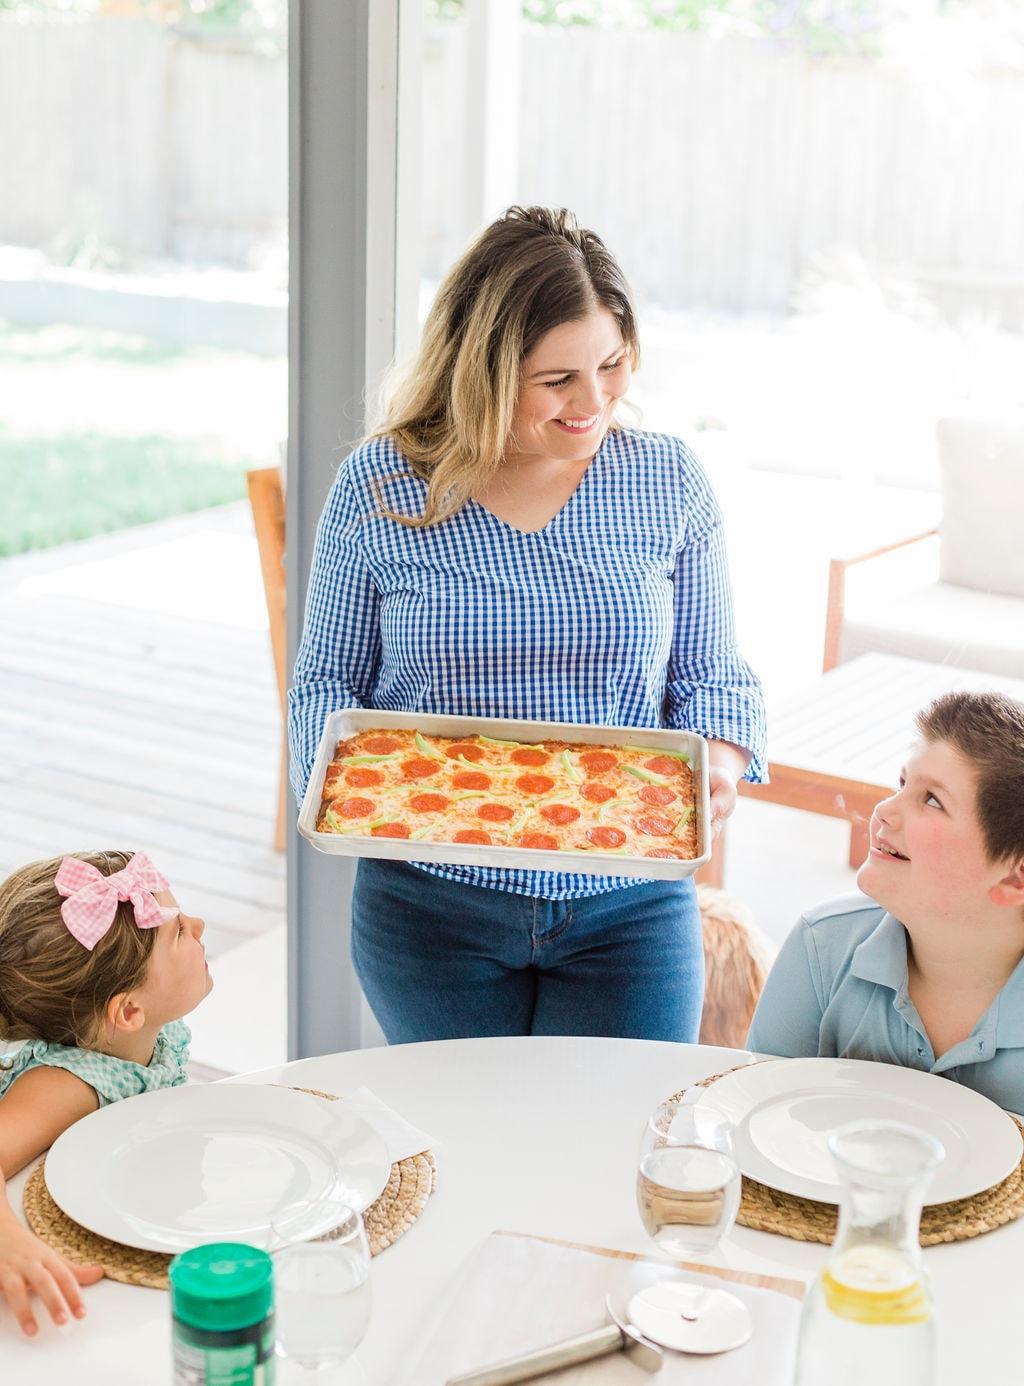 Sheet-Pan Pizza With Magic Crust